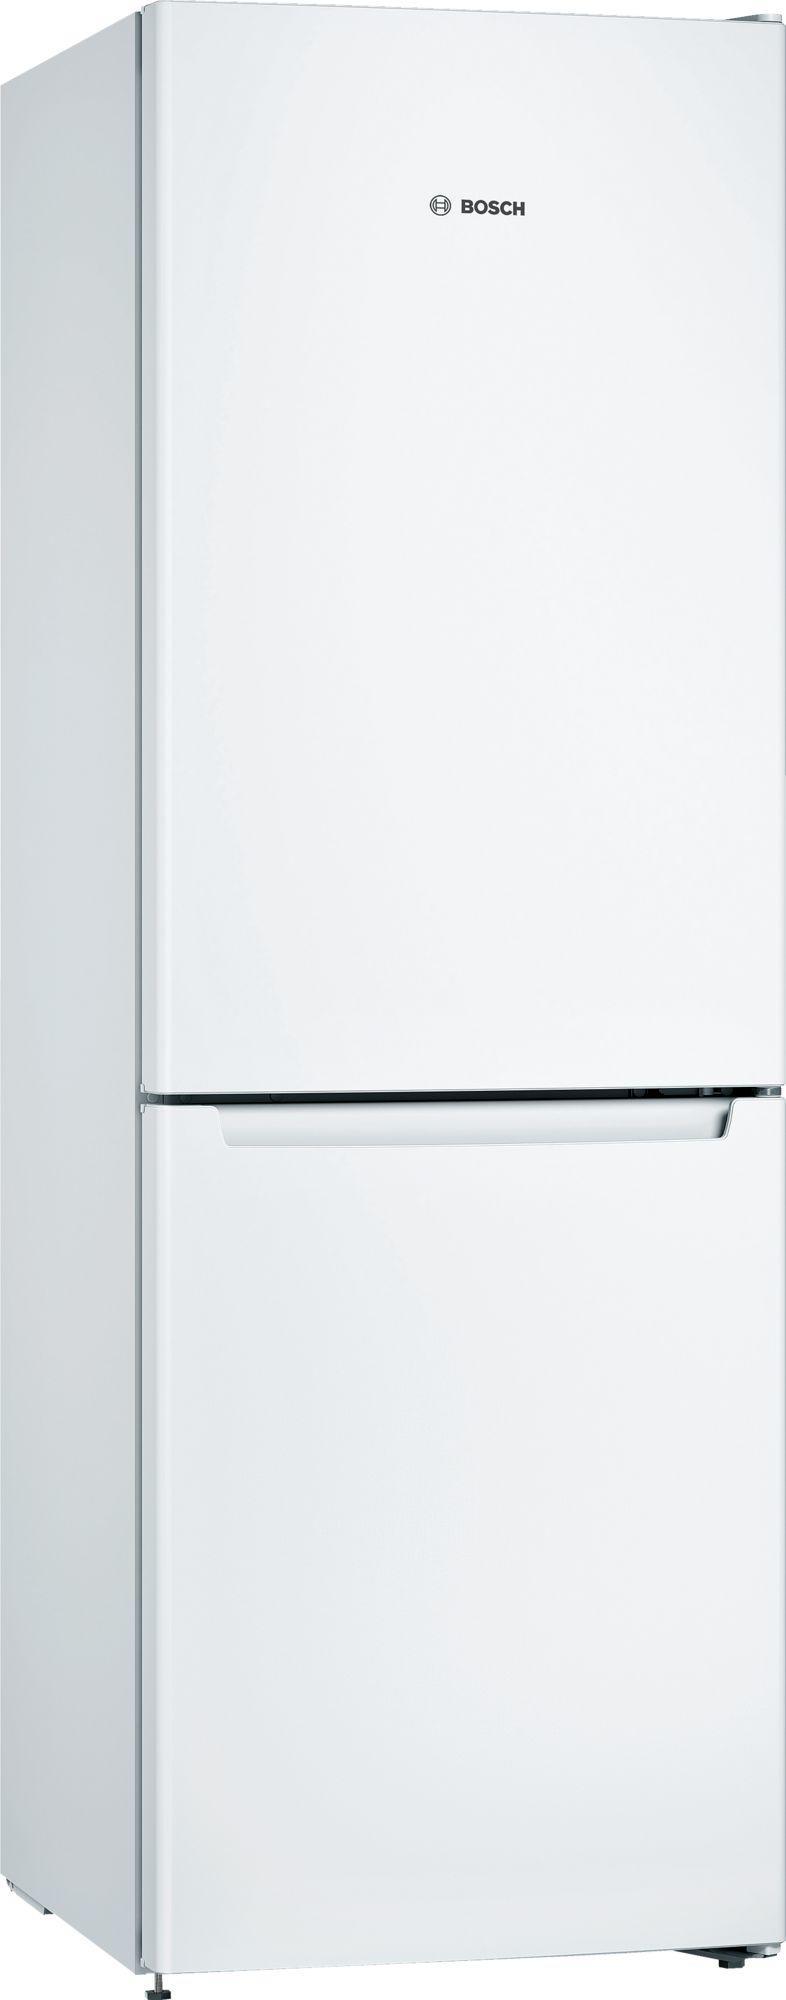 Image of Serie 2 KGN33NWEAG 60cm 306 Litre A++ Frost Free Fridge Freezer | White